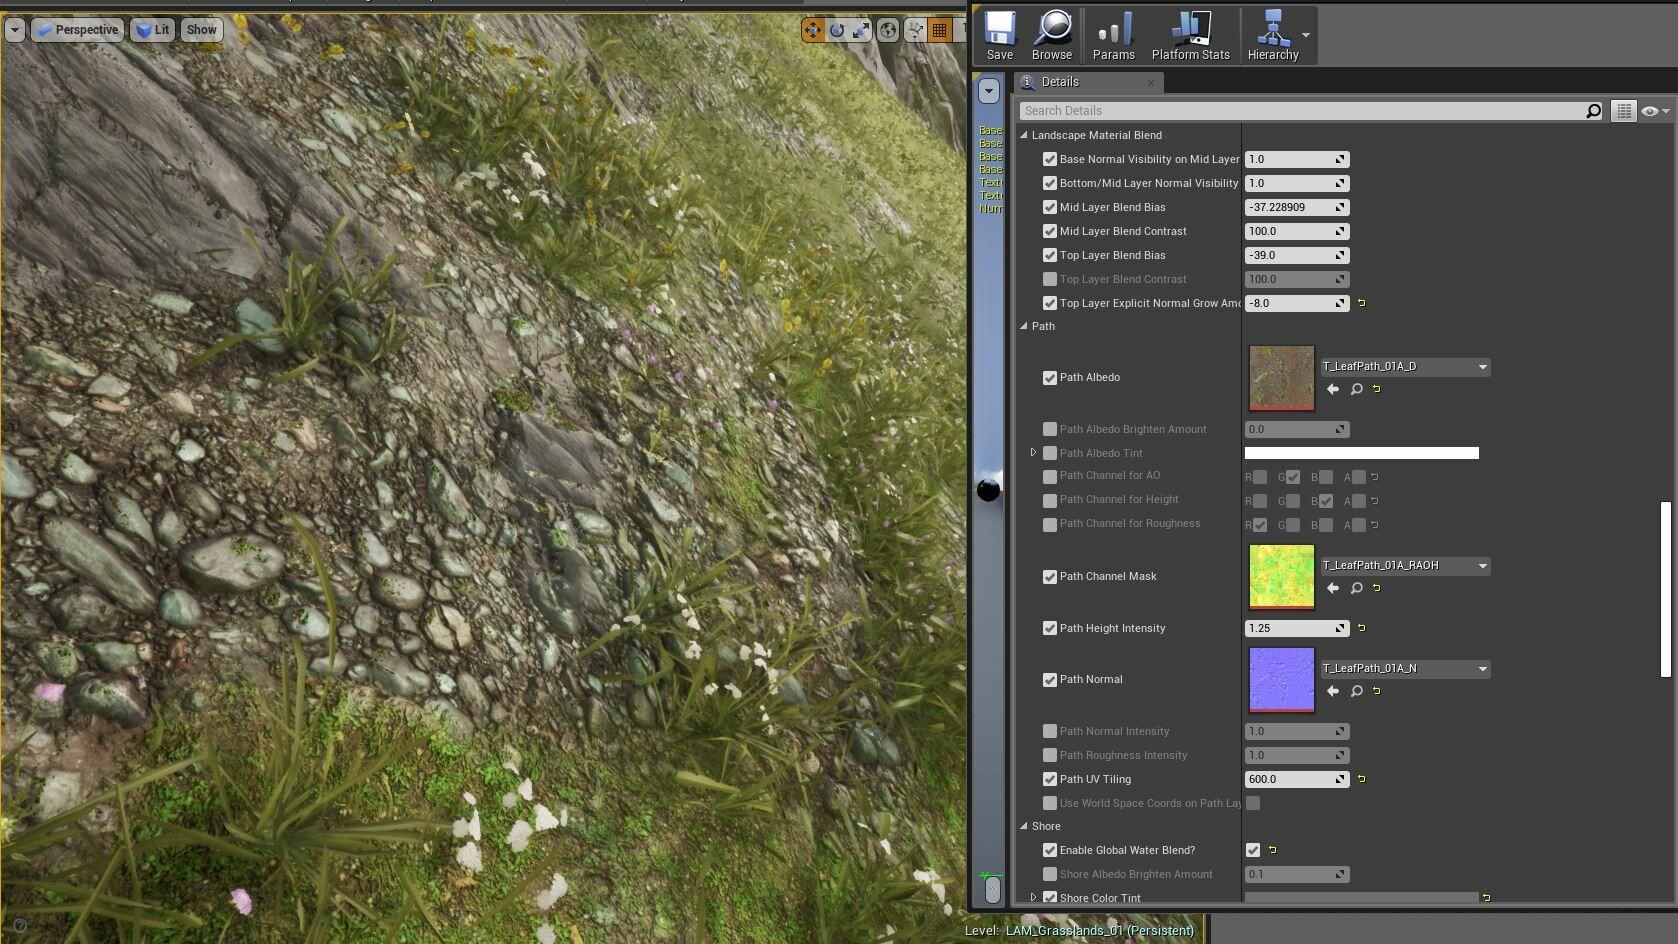 ArtStation - UE4 Auto Landscape Master Material Pack